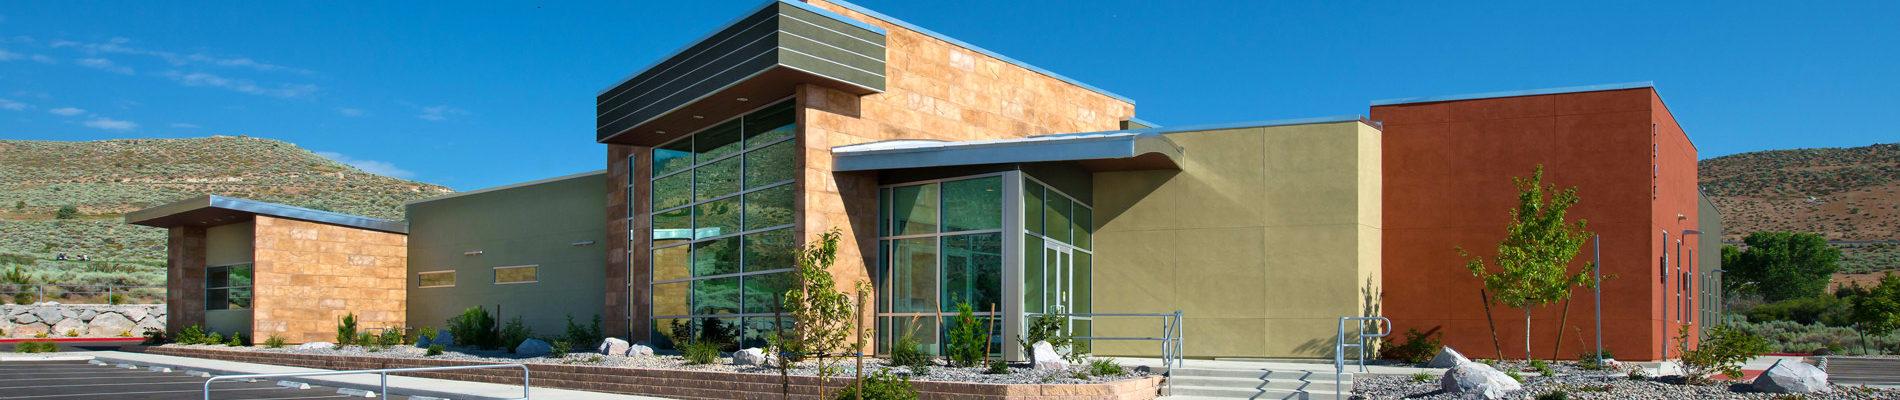 Exterior, Carson Dermatology, Carson City, Nevada - John Anderson Construction, Inc.